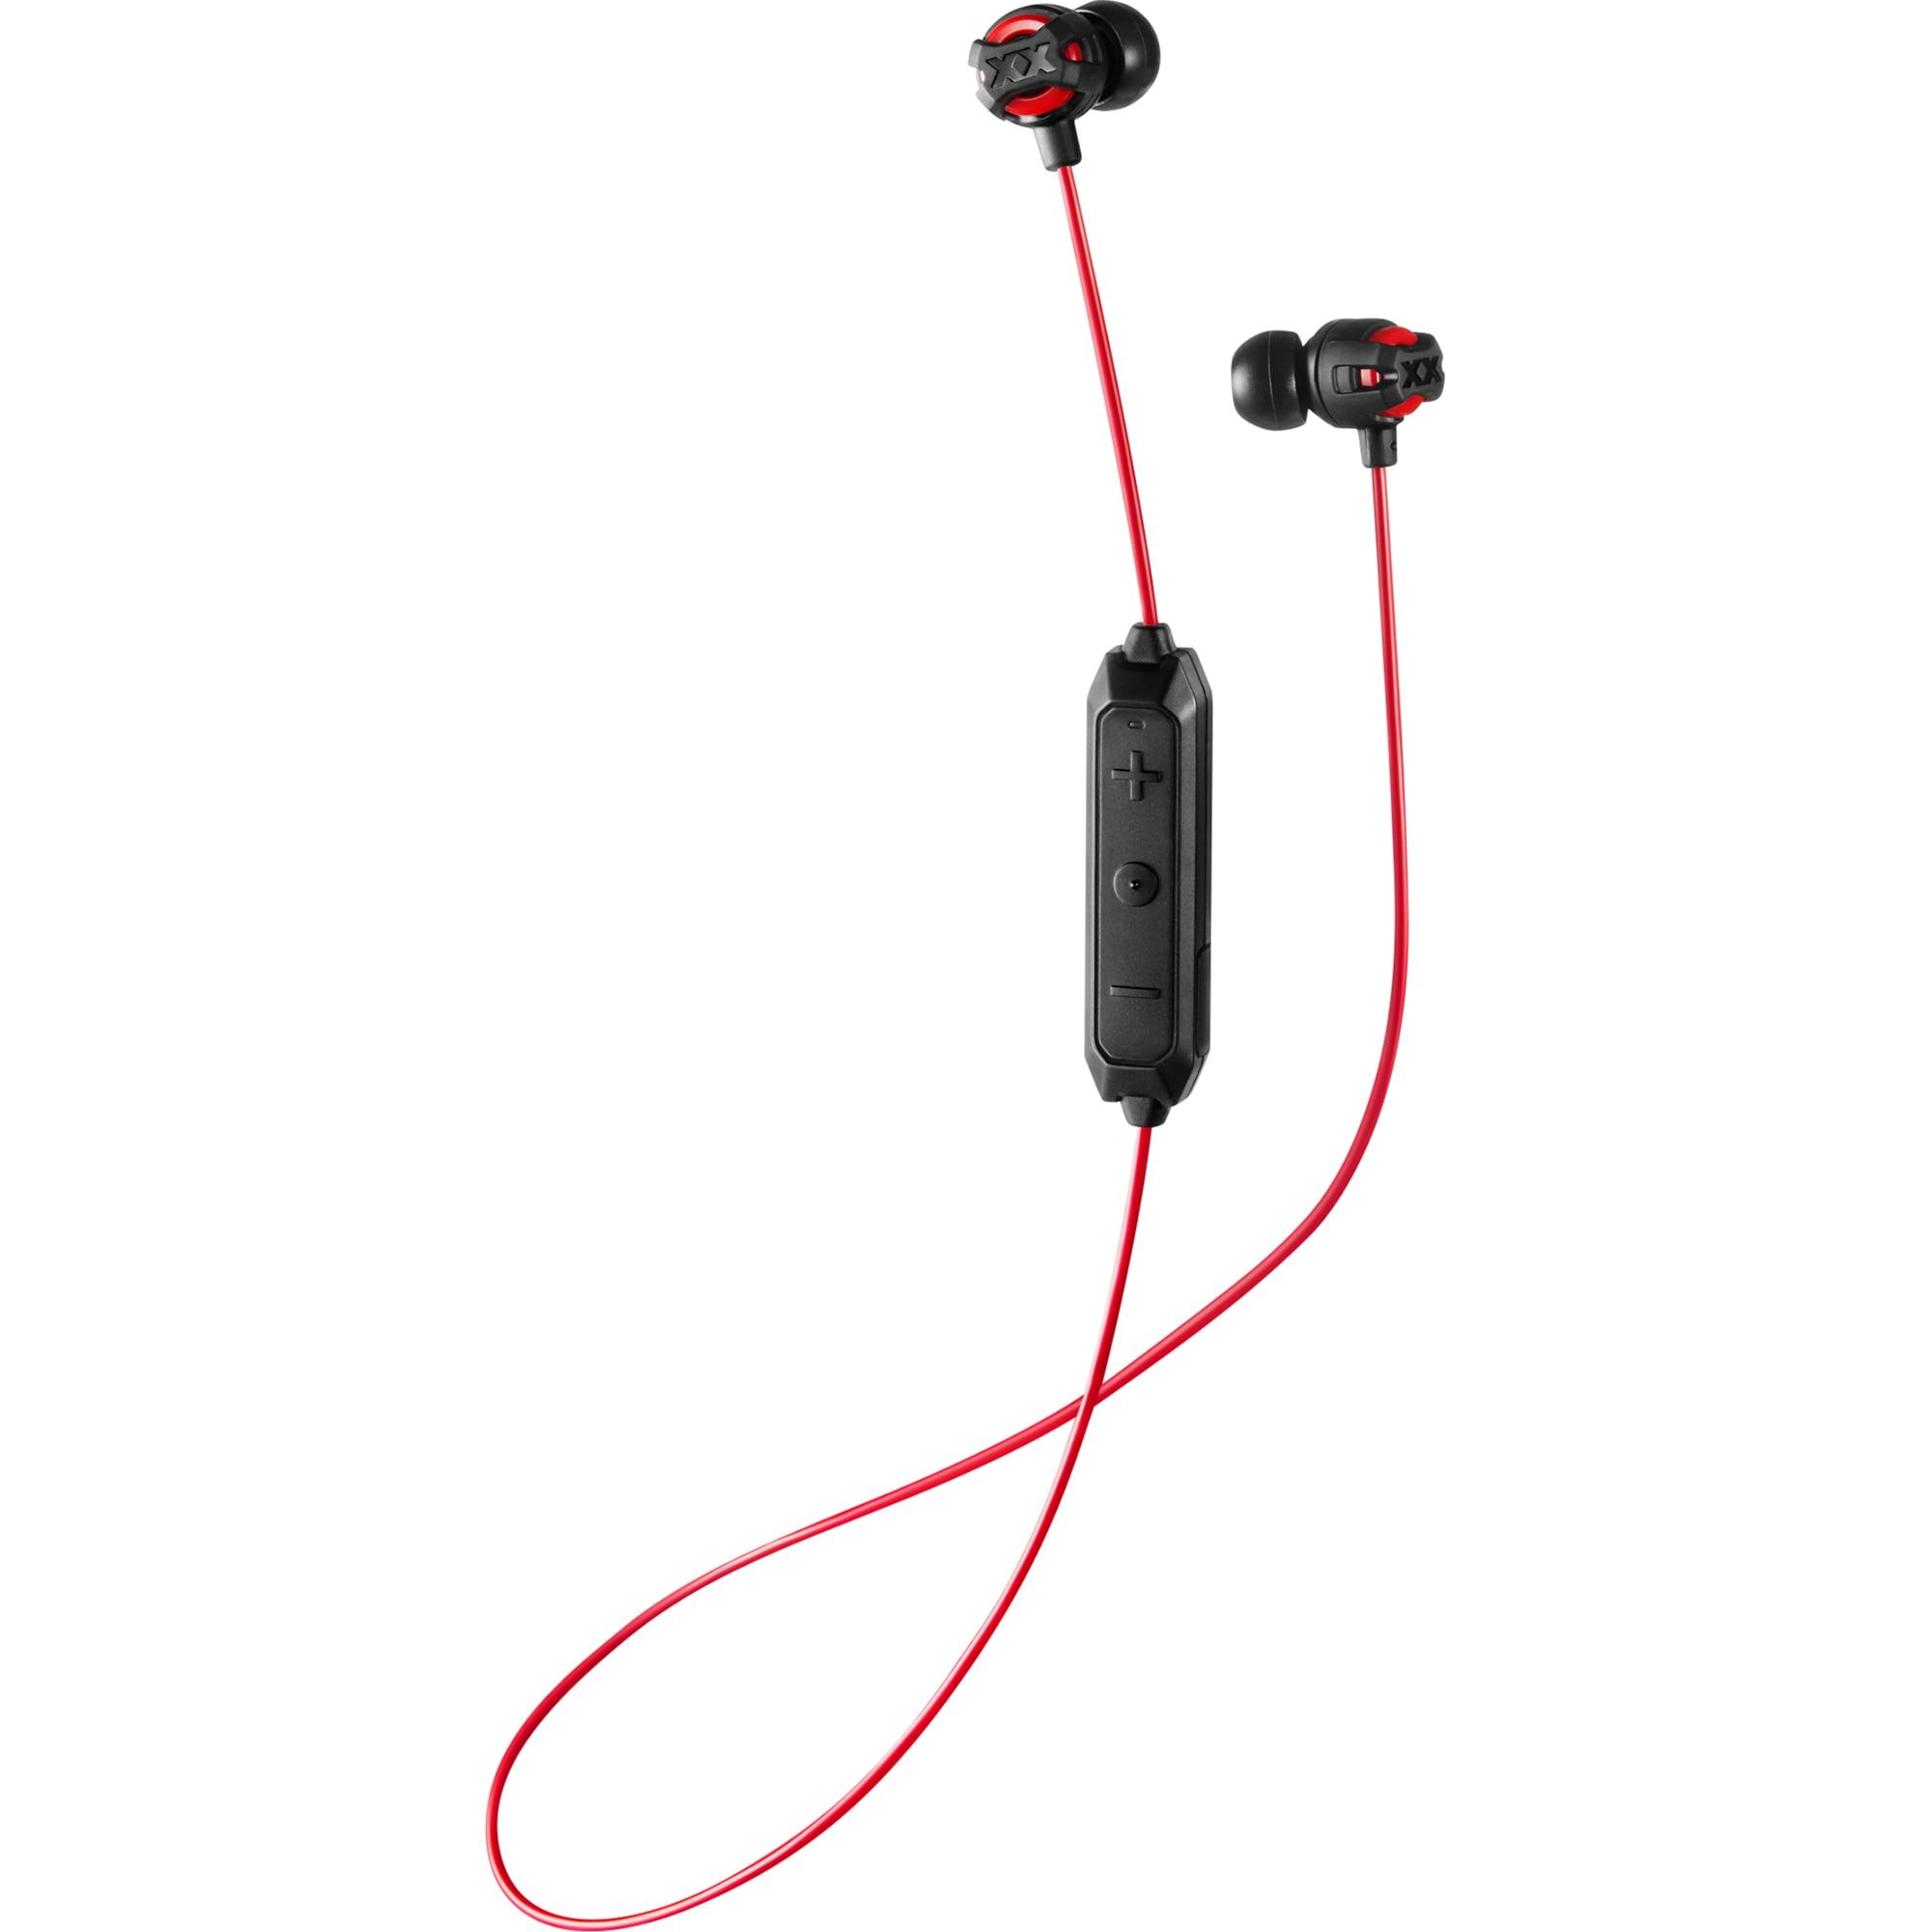 Fotografie Casti Audio In Ear JVC HA-FX103BT-RE, Wireless, Bluetooth, Microfon, Autonomie 5 ore, Rosu